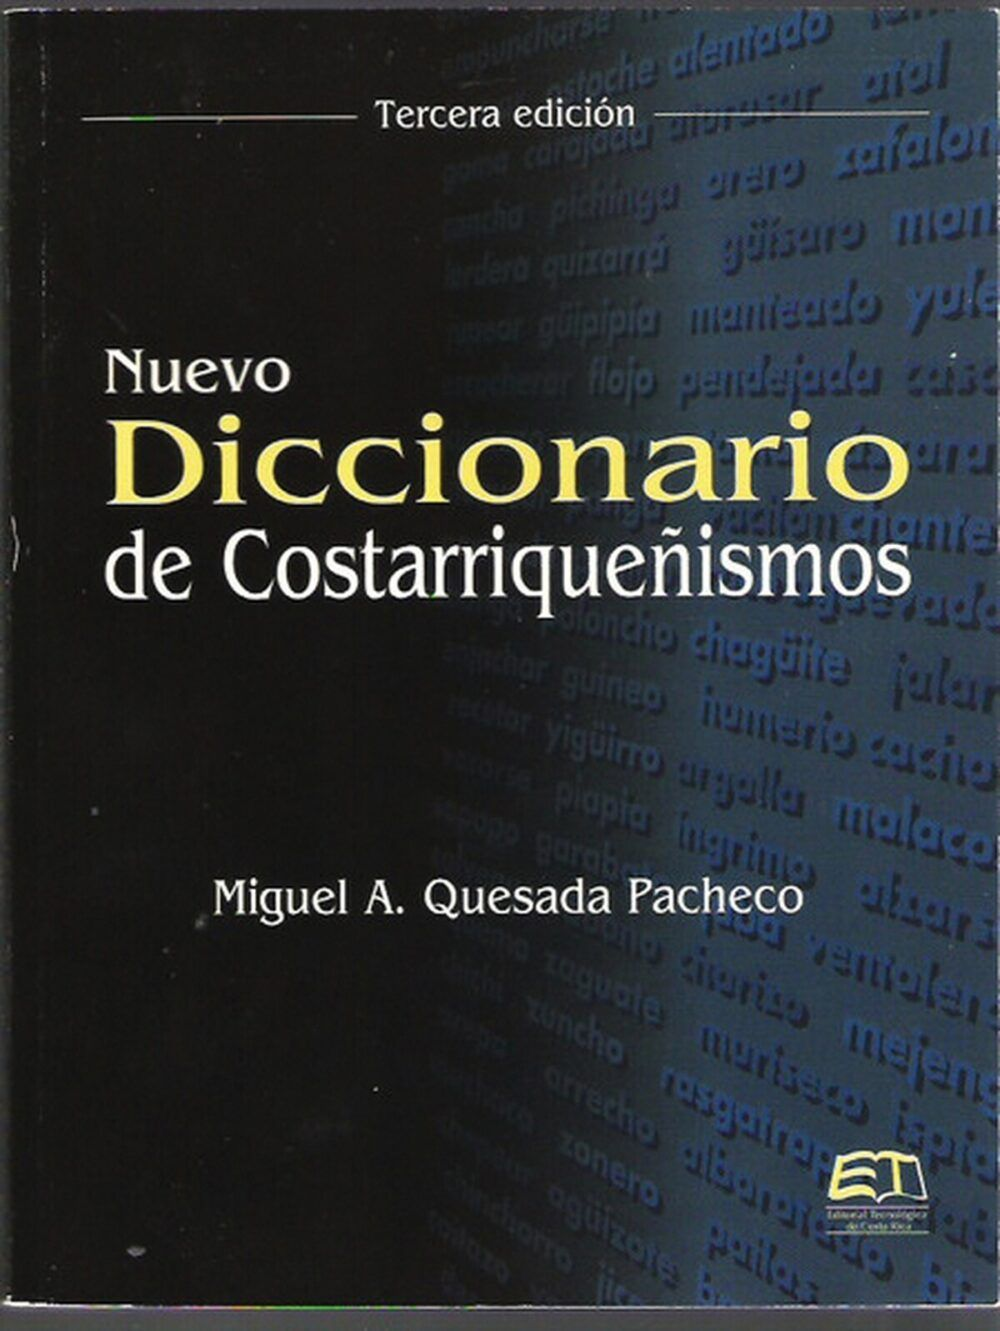 palabras en costarricense